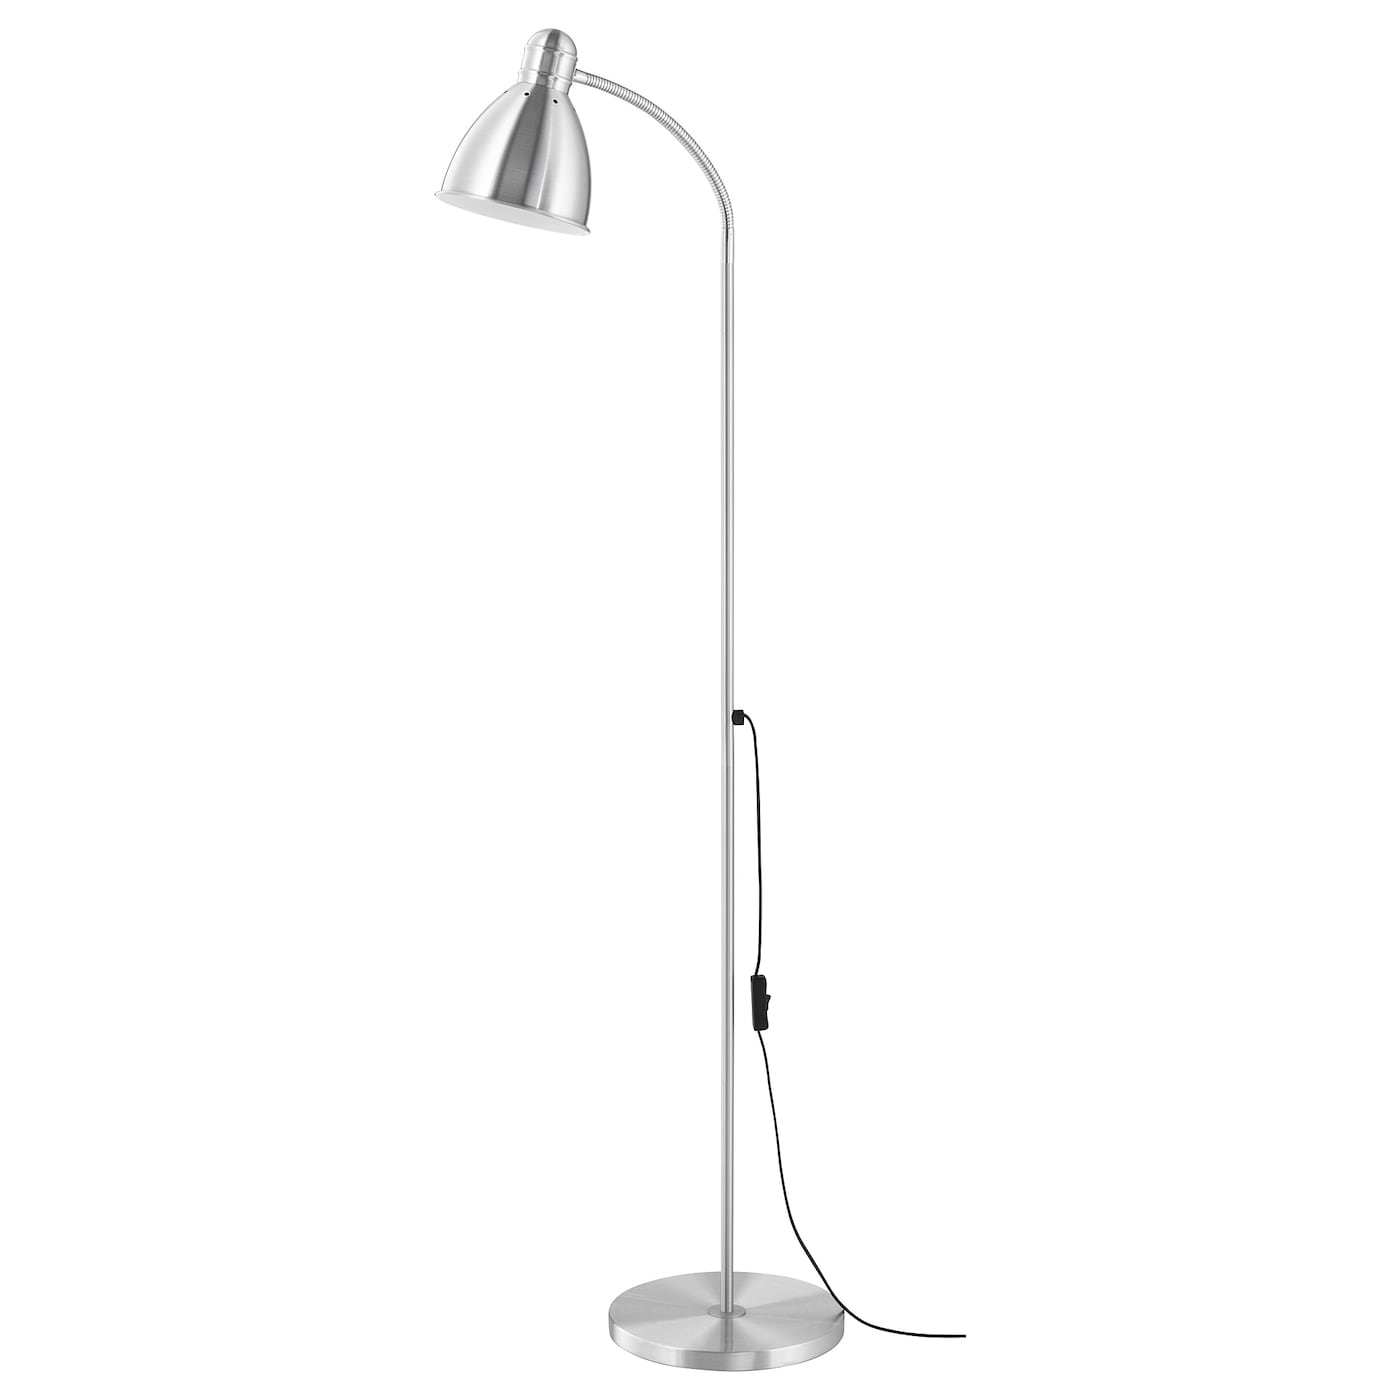 Lersta Stand Leseleuchte Aluminium Ikea Deutschland